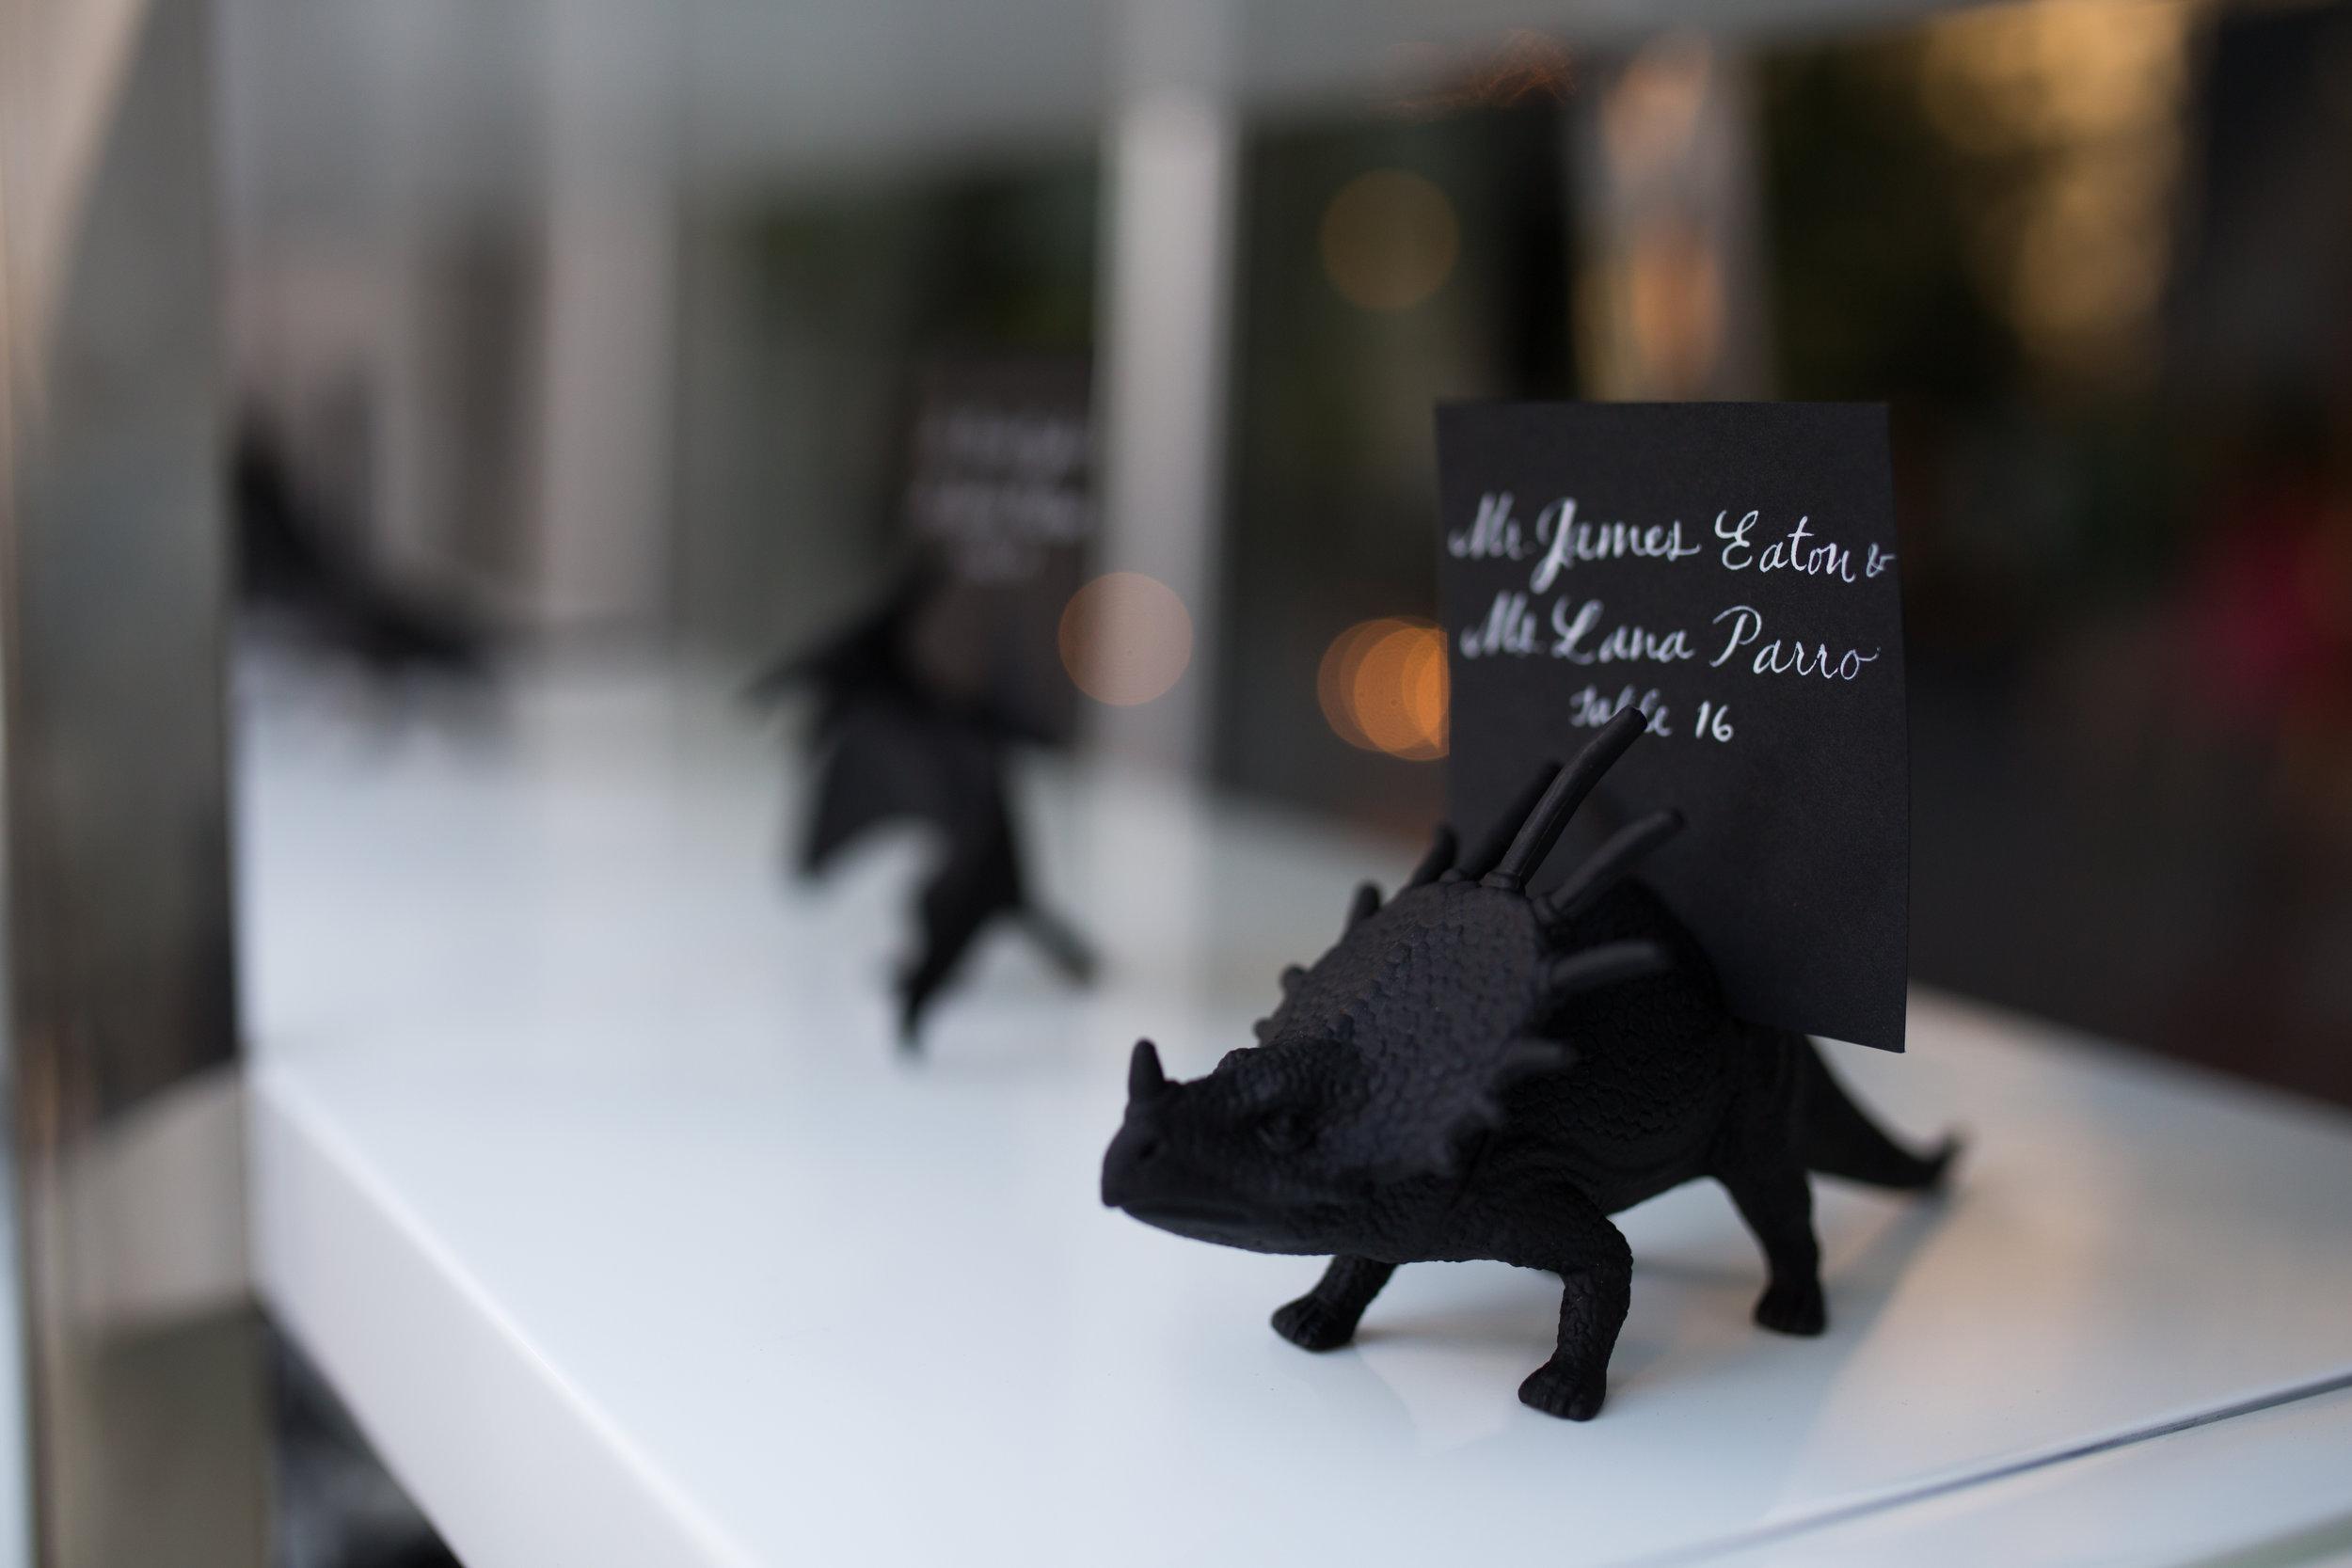 wedding details from MCA, Chicago